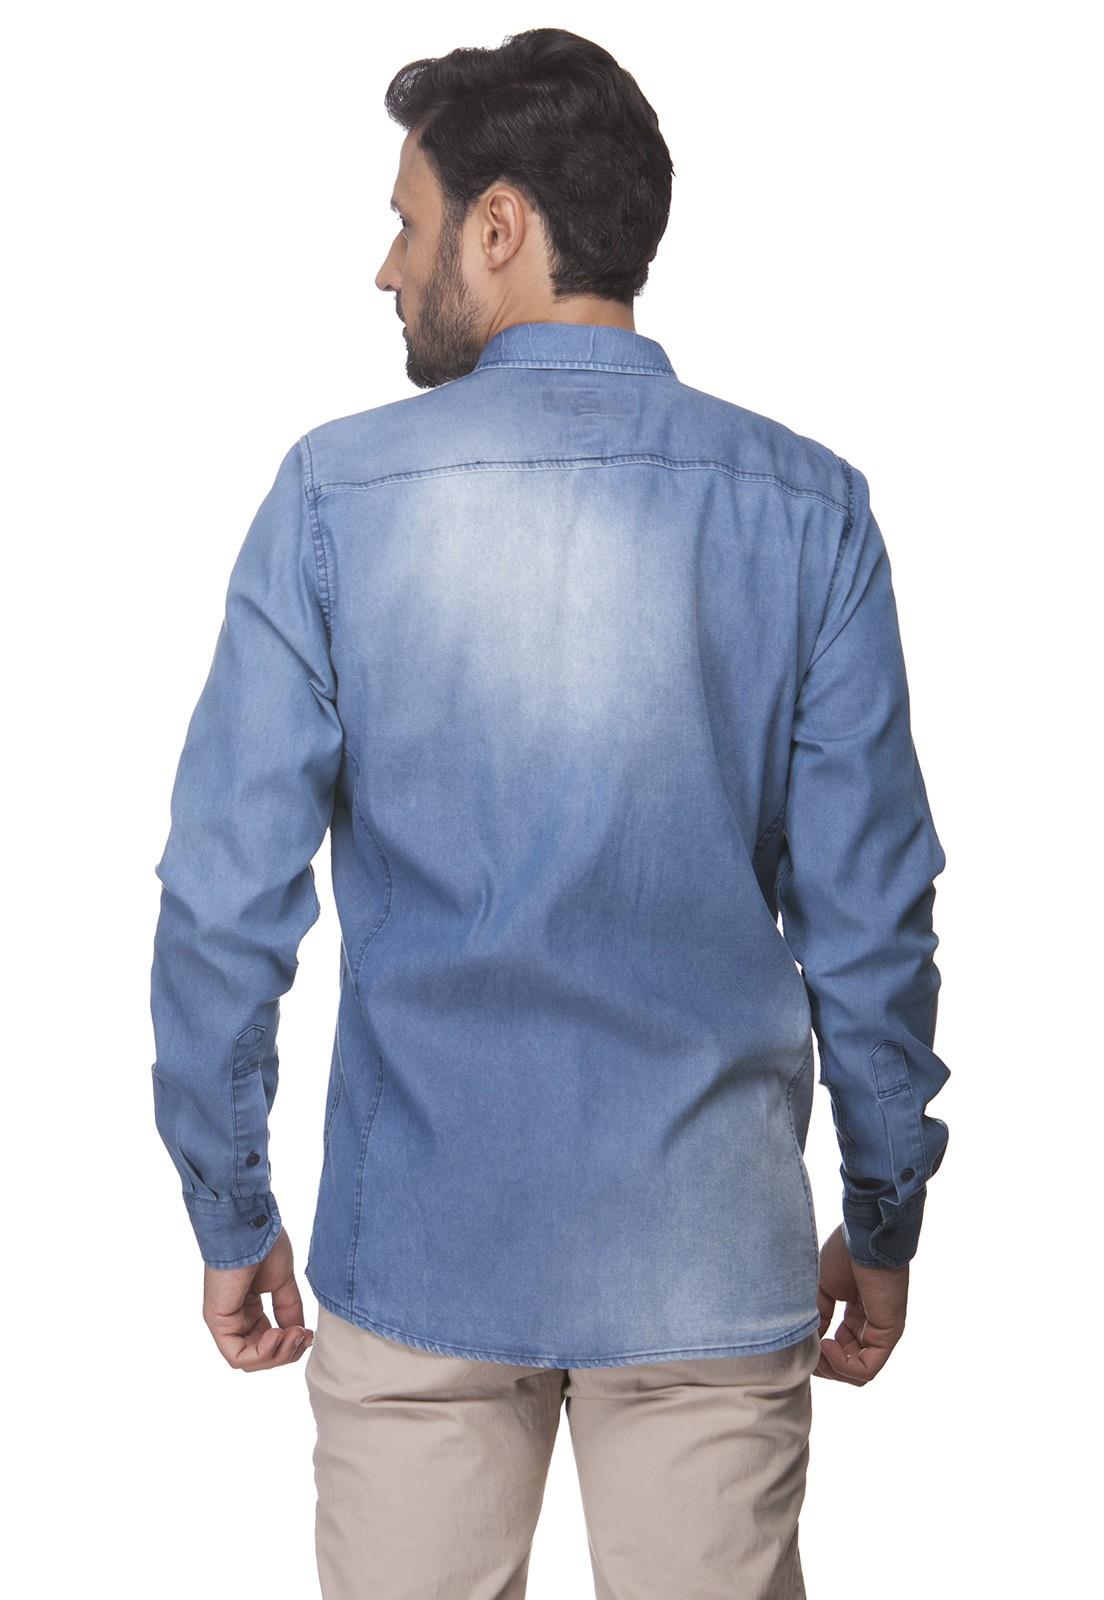 Camisa Slim Zaiko Jeans Manga Longa 2358